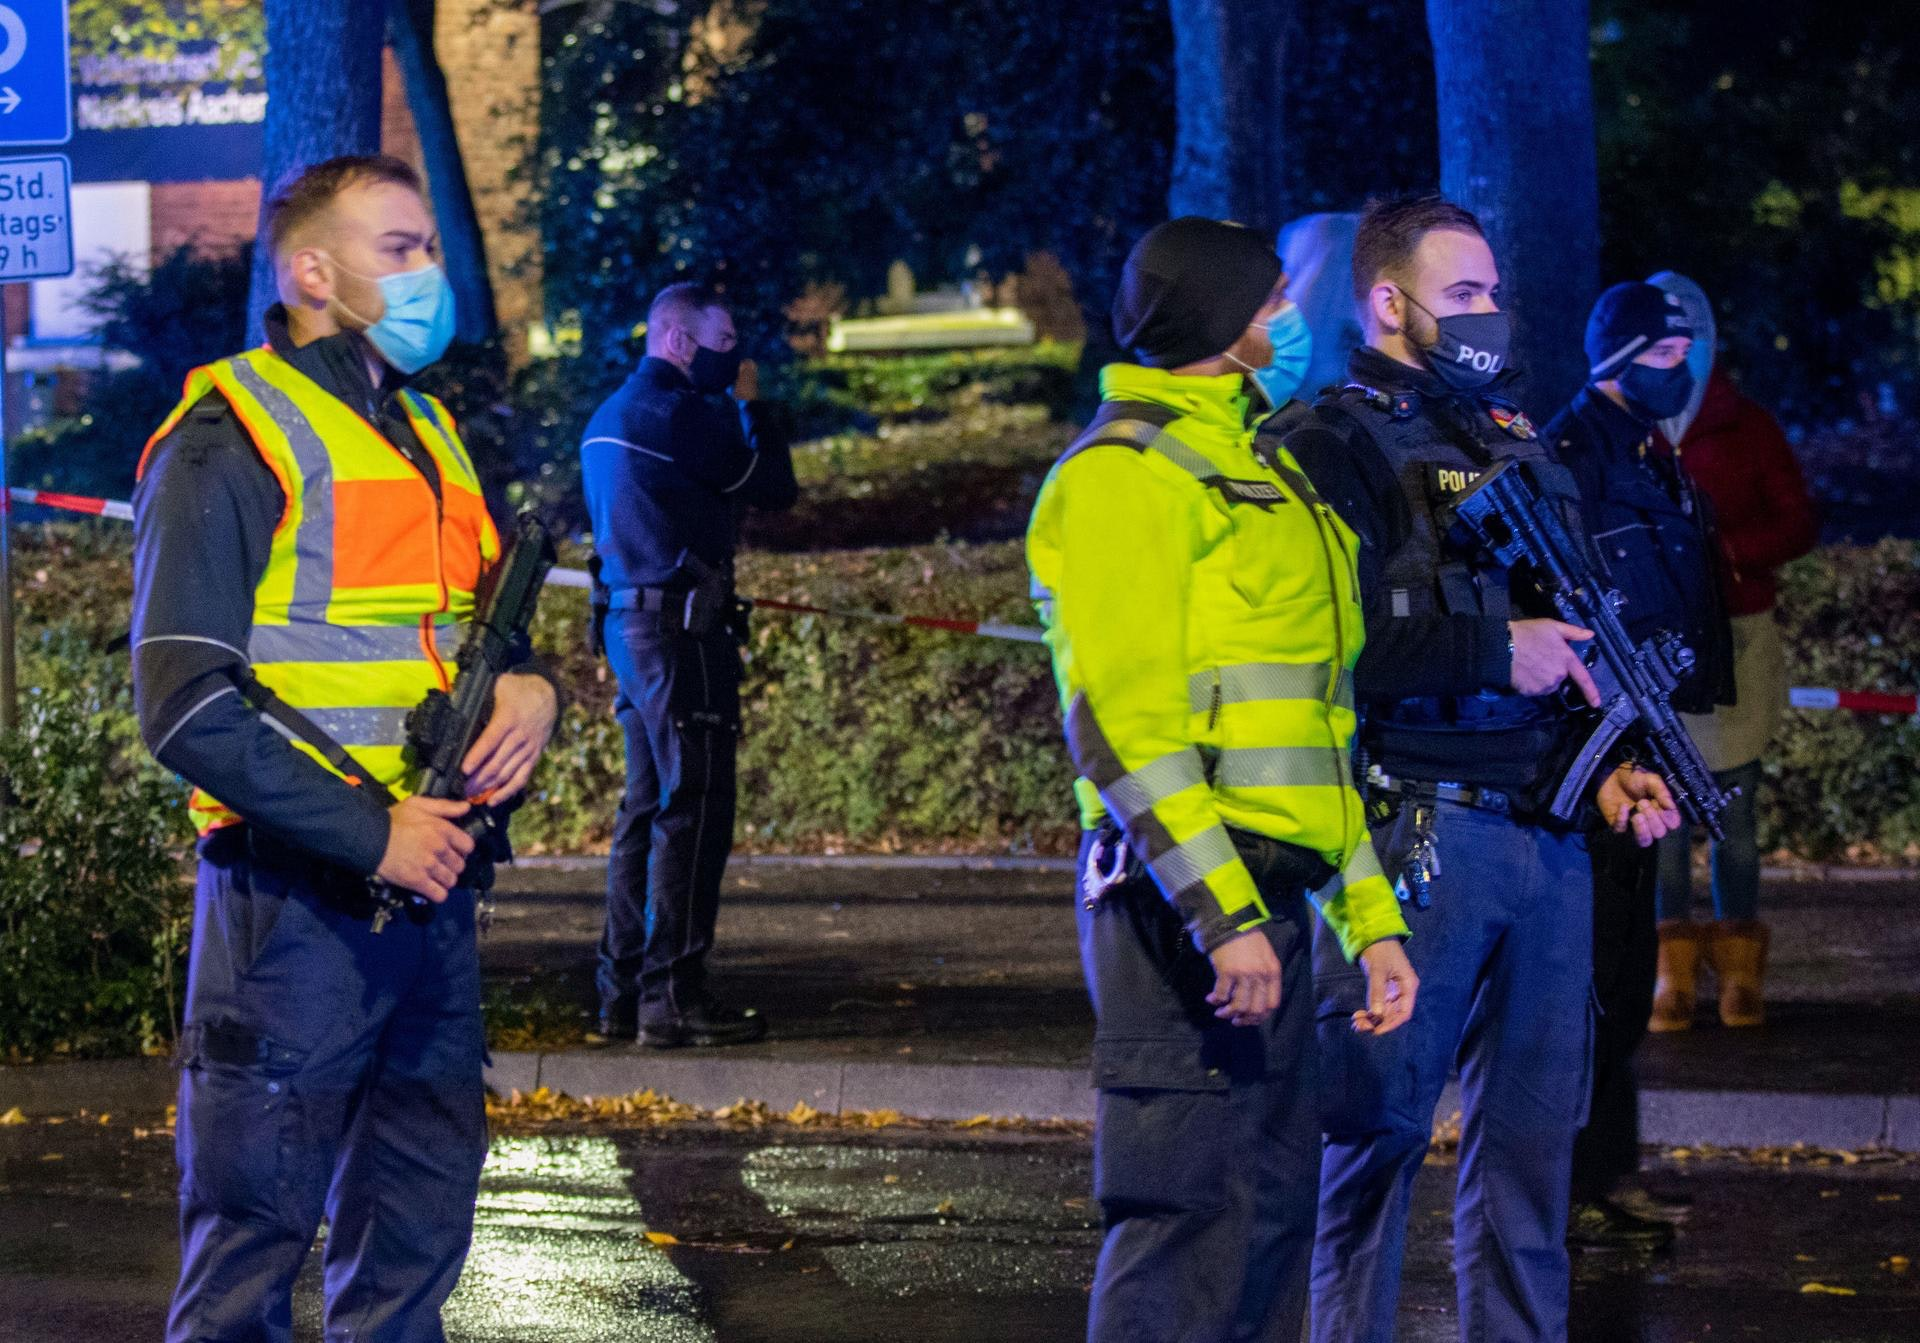 Rocker in Alsdorf erschossen: Tatverdächtiger stellt sich